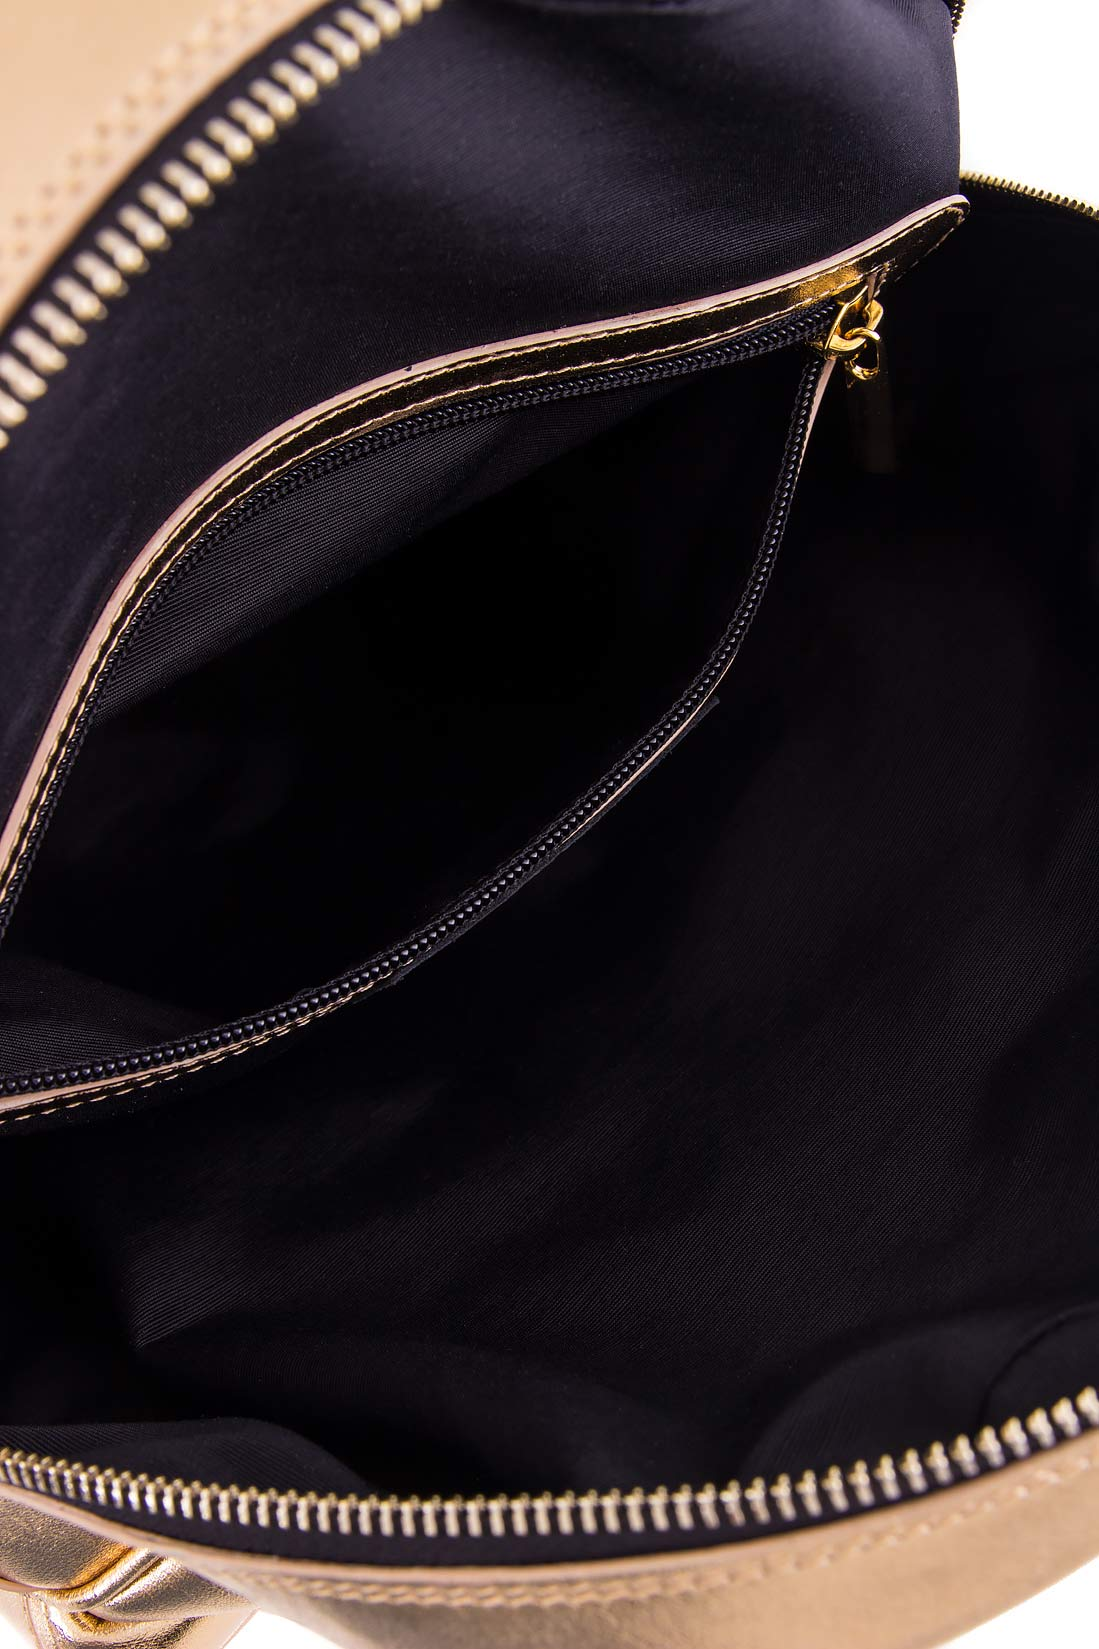 Metallic leather backpack Laura Olaru image 3